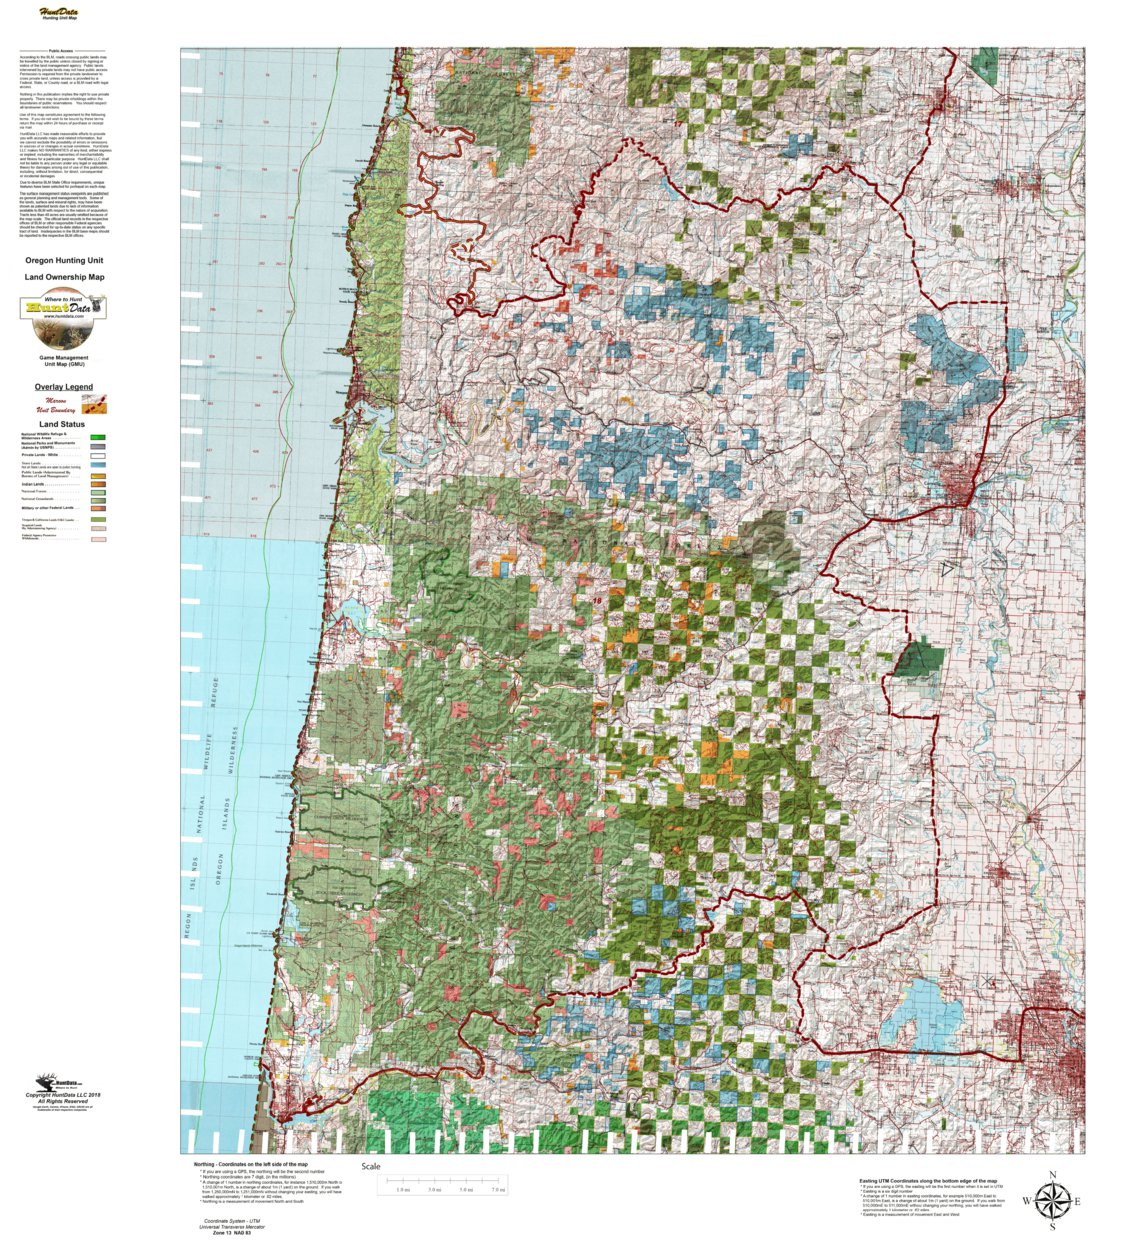 Alsea Oregon Map.Oregon Hunting Unit 18 Alsea Land Ownership Map Huntdata Llc